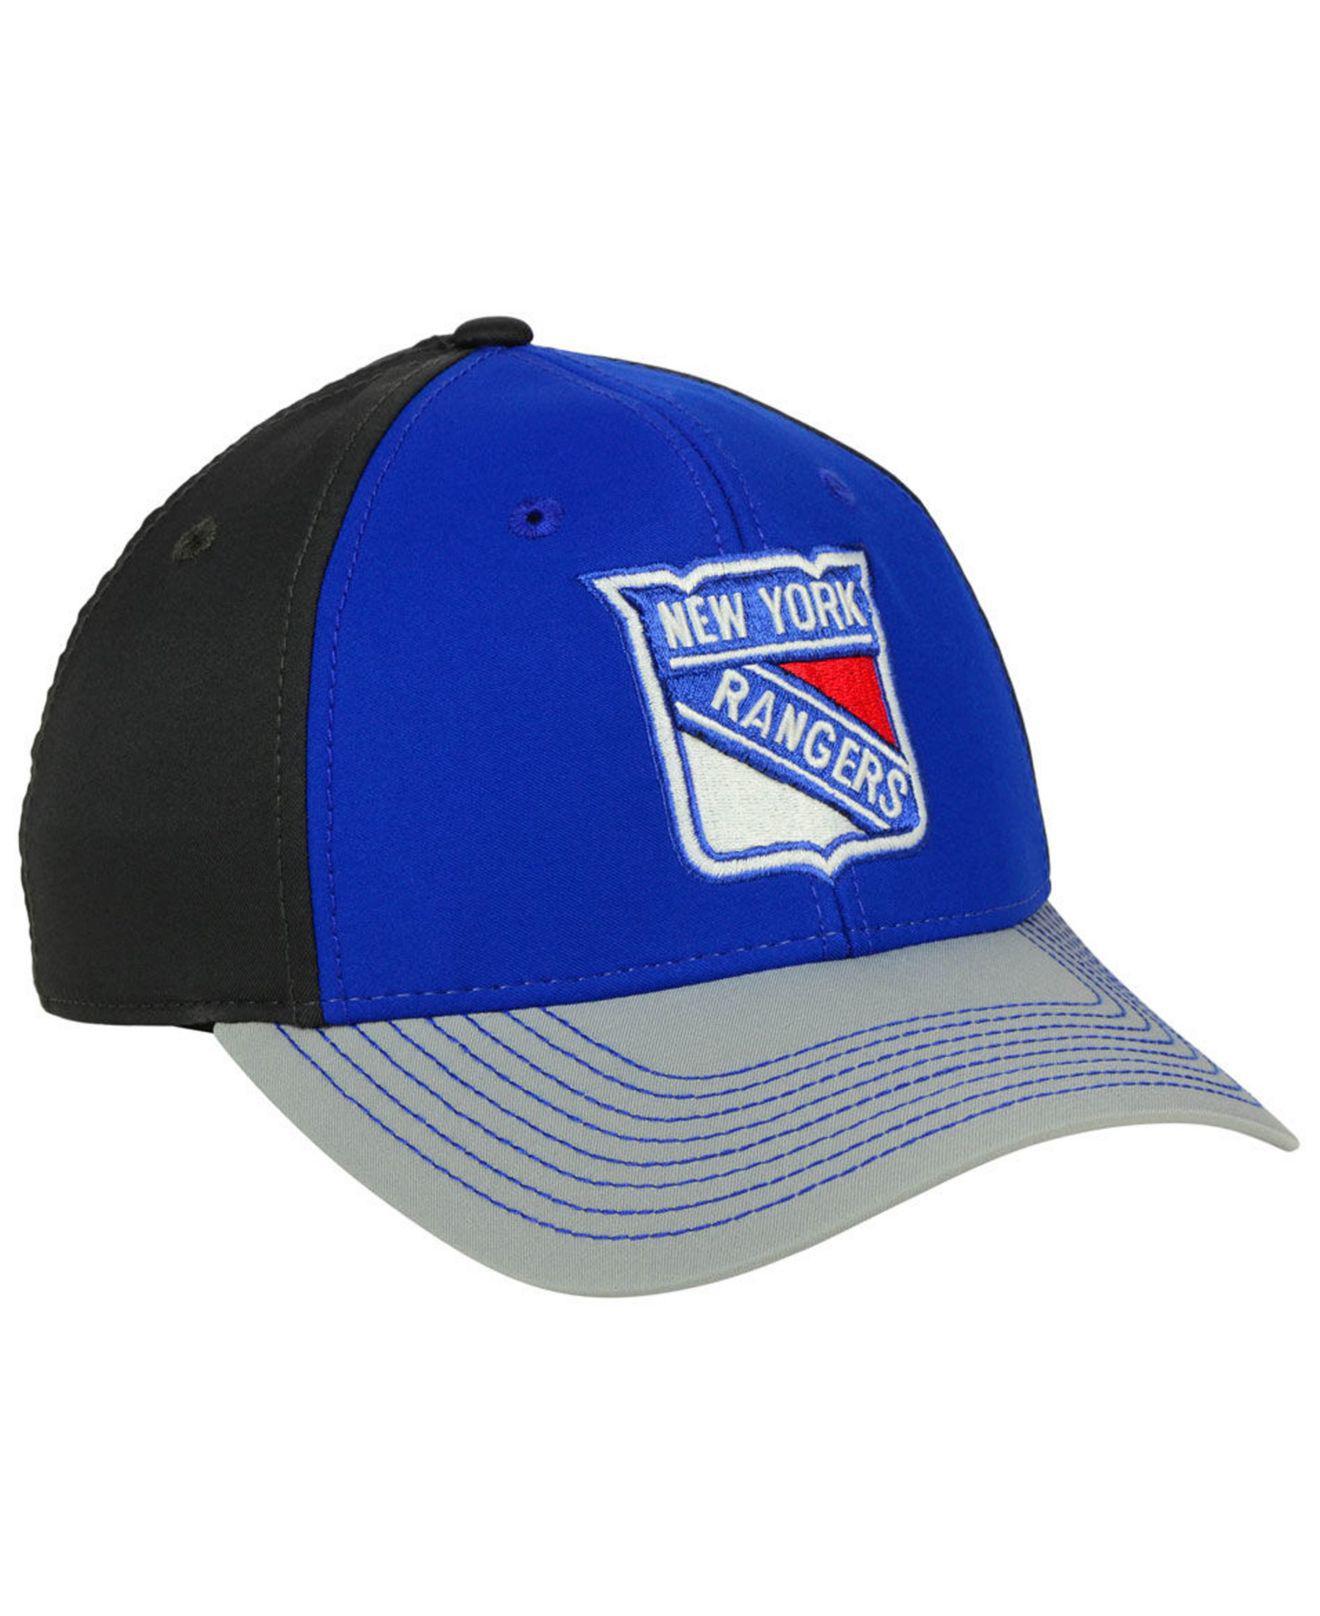 official photos c6e39 9861f ... greece lyst adidas new york rangers 2tone stitch flex cap in blue for  men bc770 ef72a